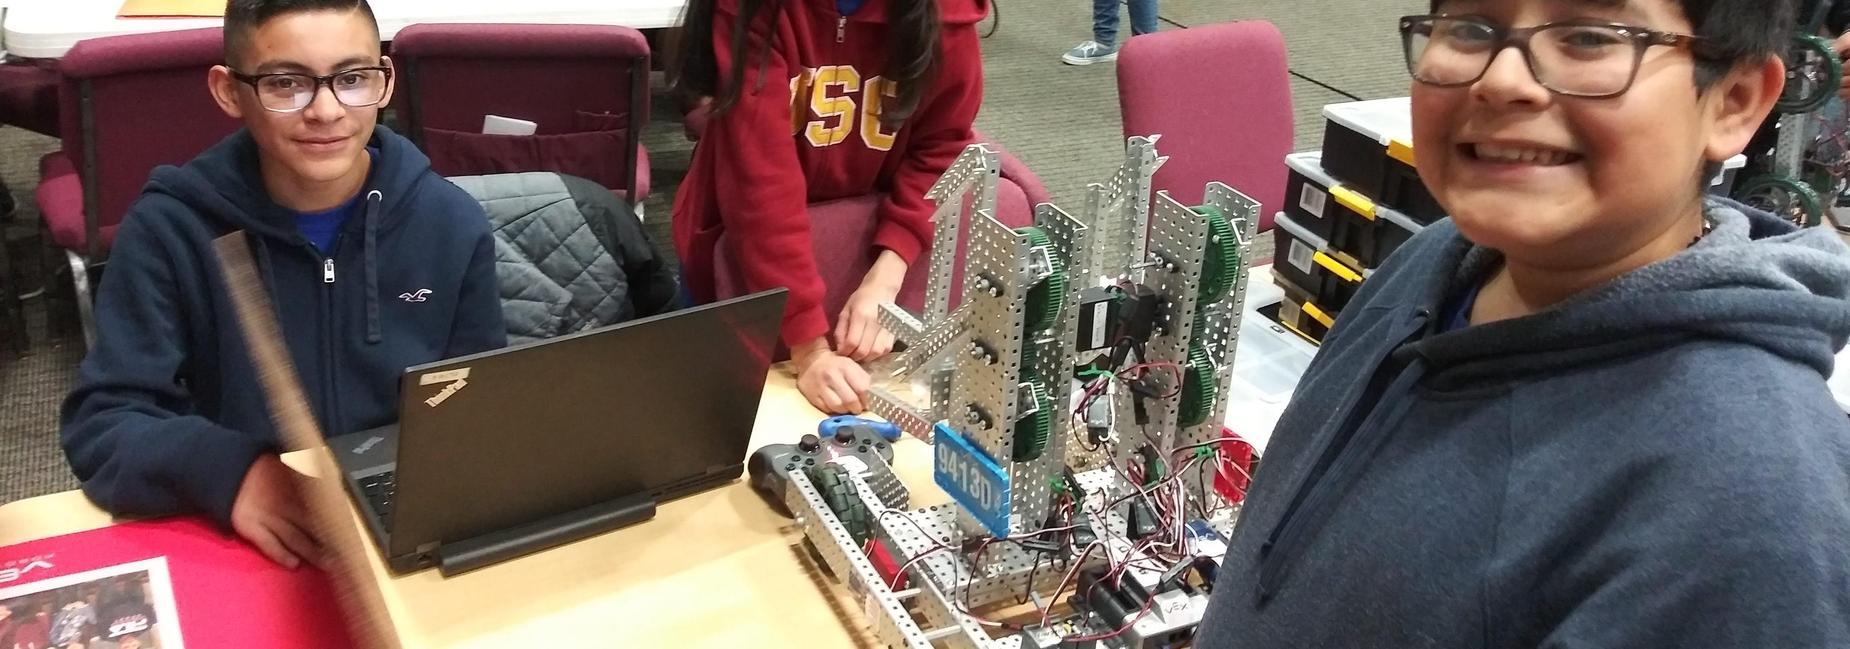 Robotics 4